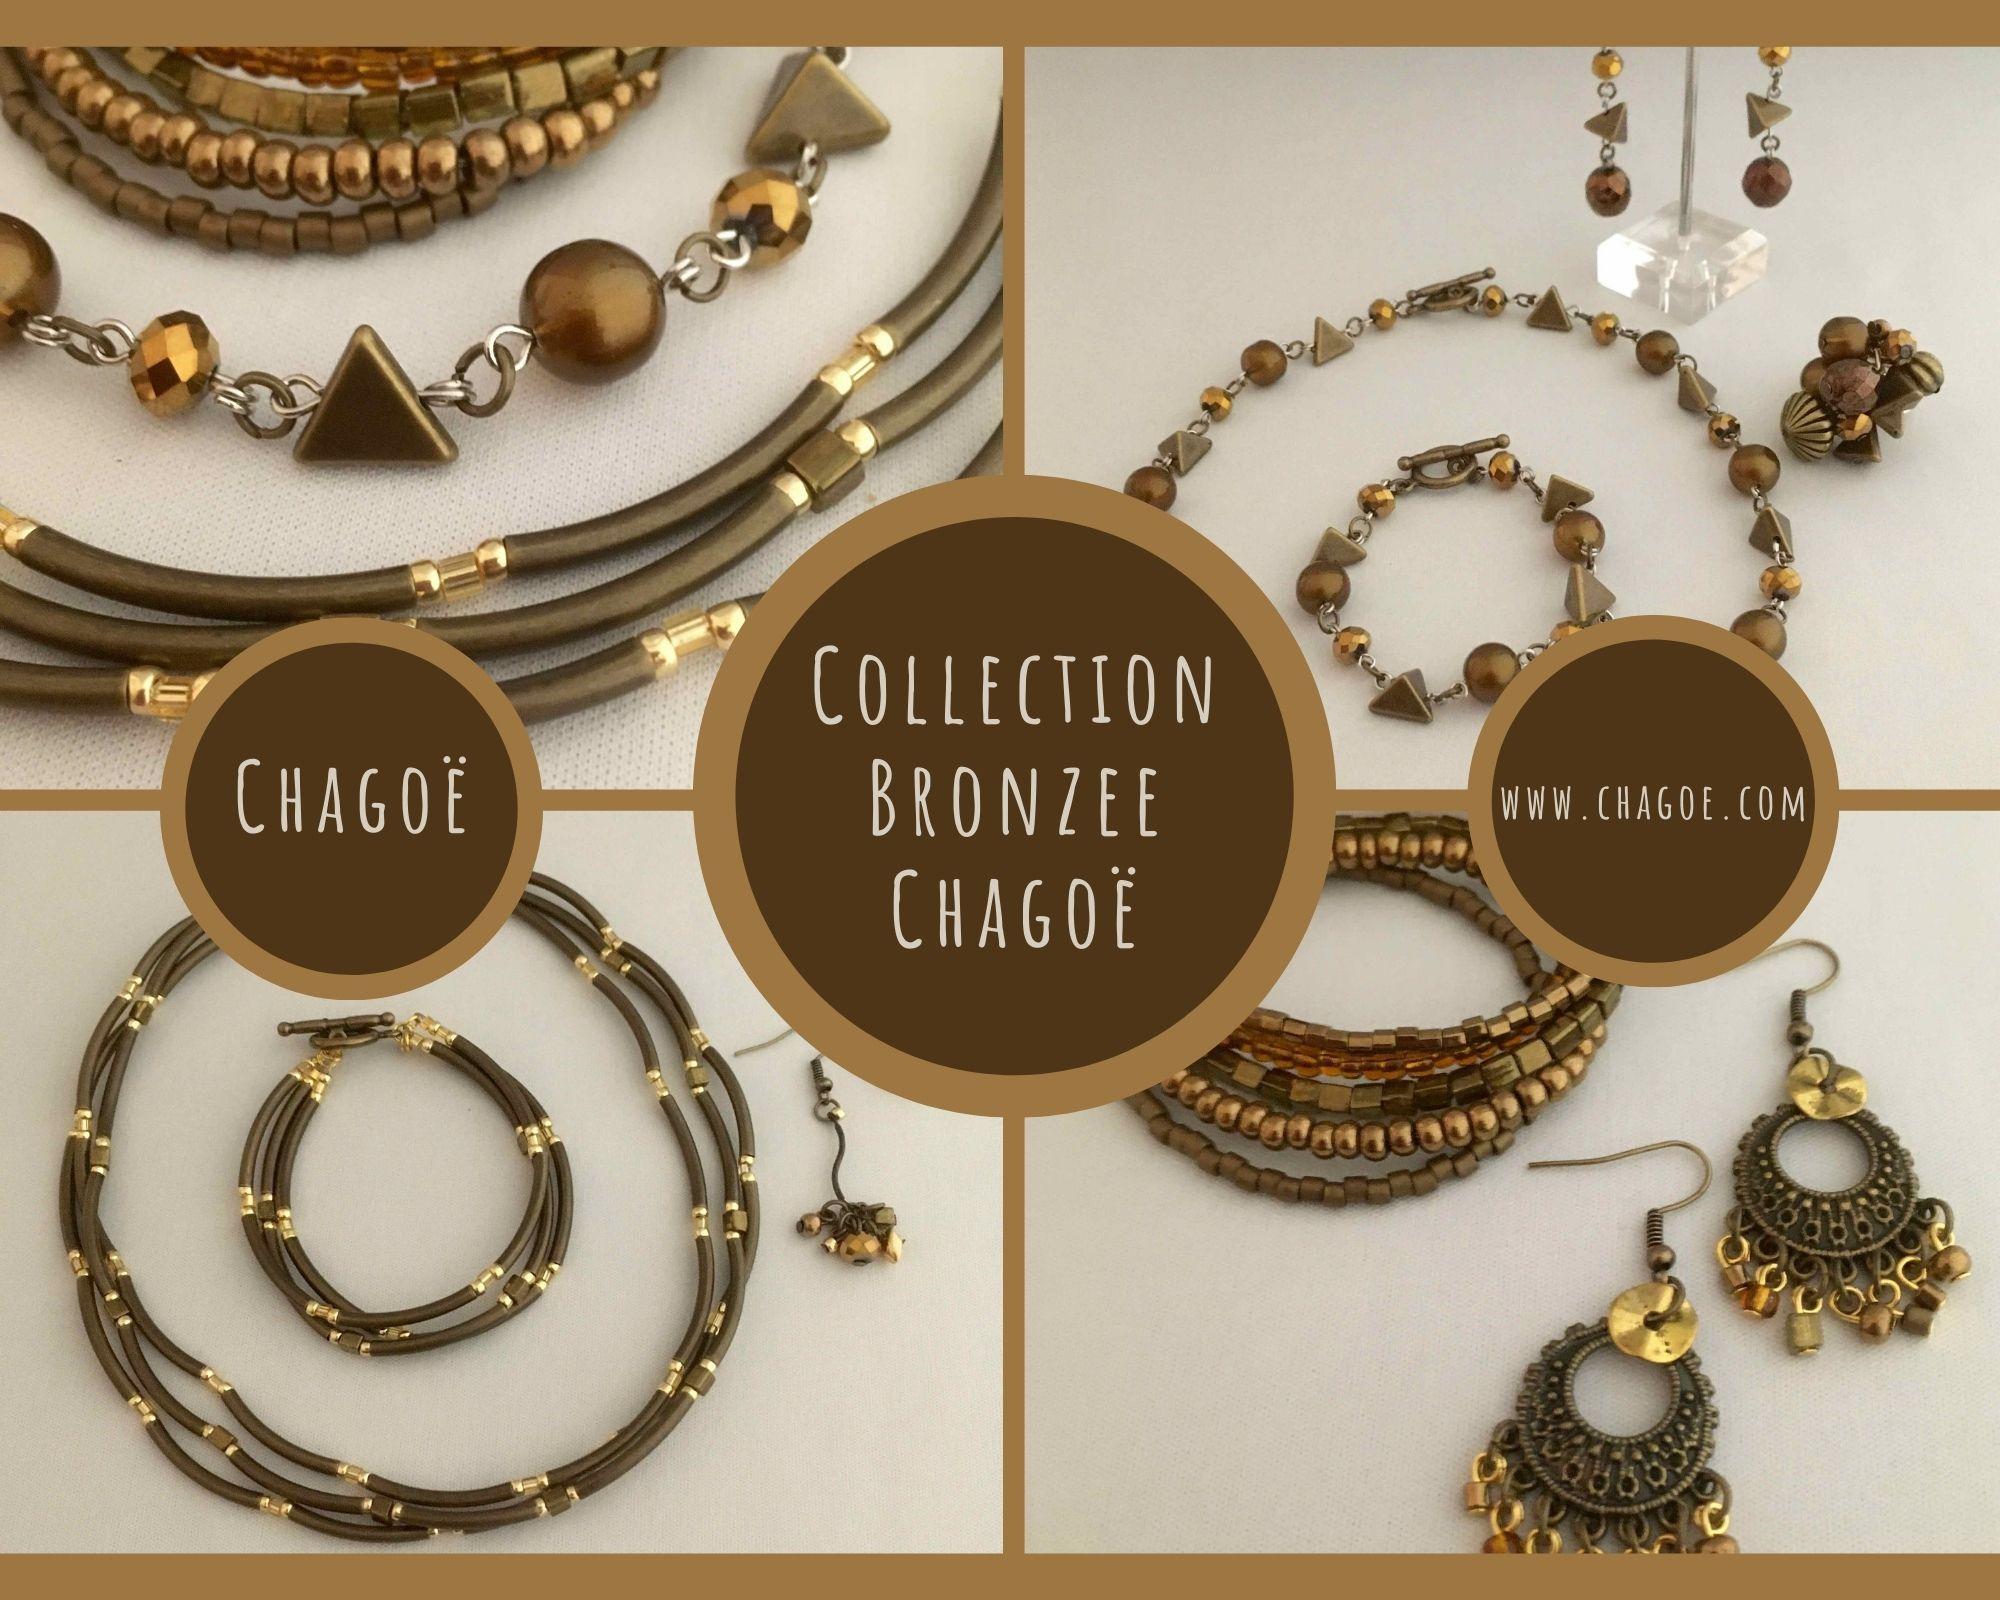 Collection BRONZEE Chagoë 2021